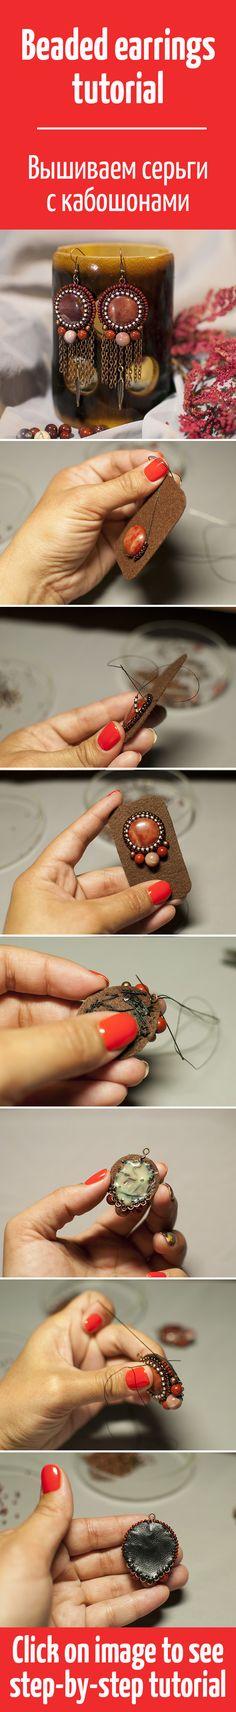 Вышиваем бисером серьги с кабошонами / Beaded earrings tutorial Bead Embroidery Tutorial, Beaded Embroidery, Macrame Earrings, Beaded Jewelry, Jewellery, Beading Tutorials, Beading Patterns, Seed Bead Projects, Earring Tutorial